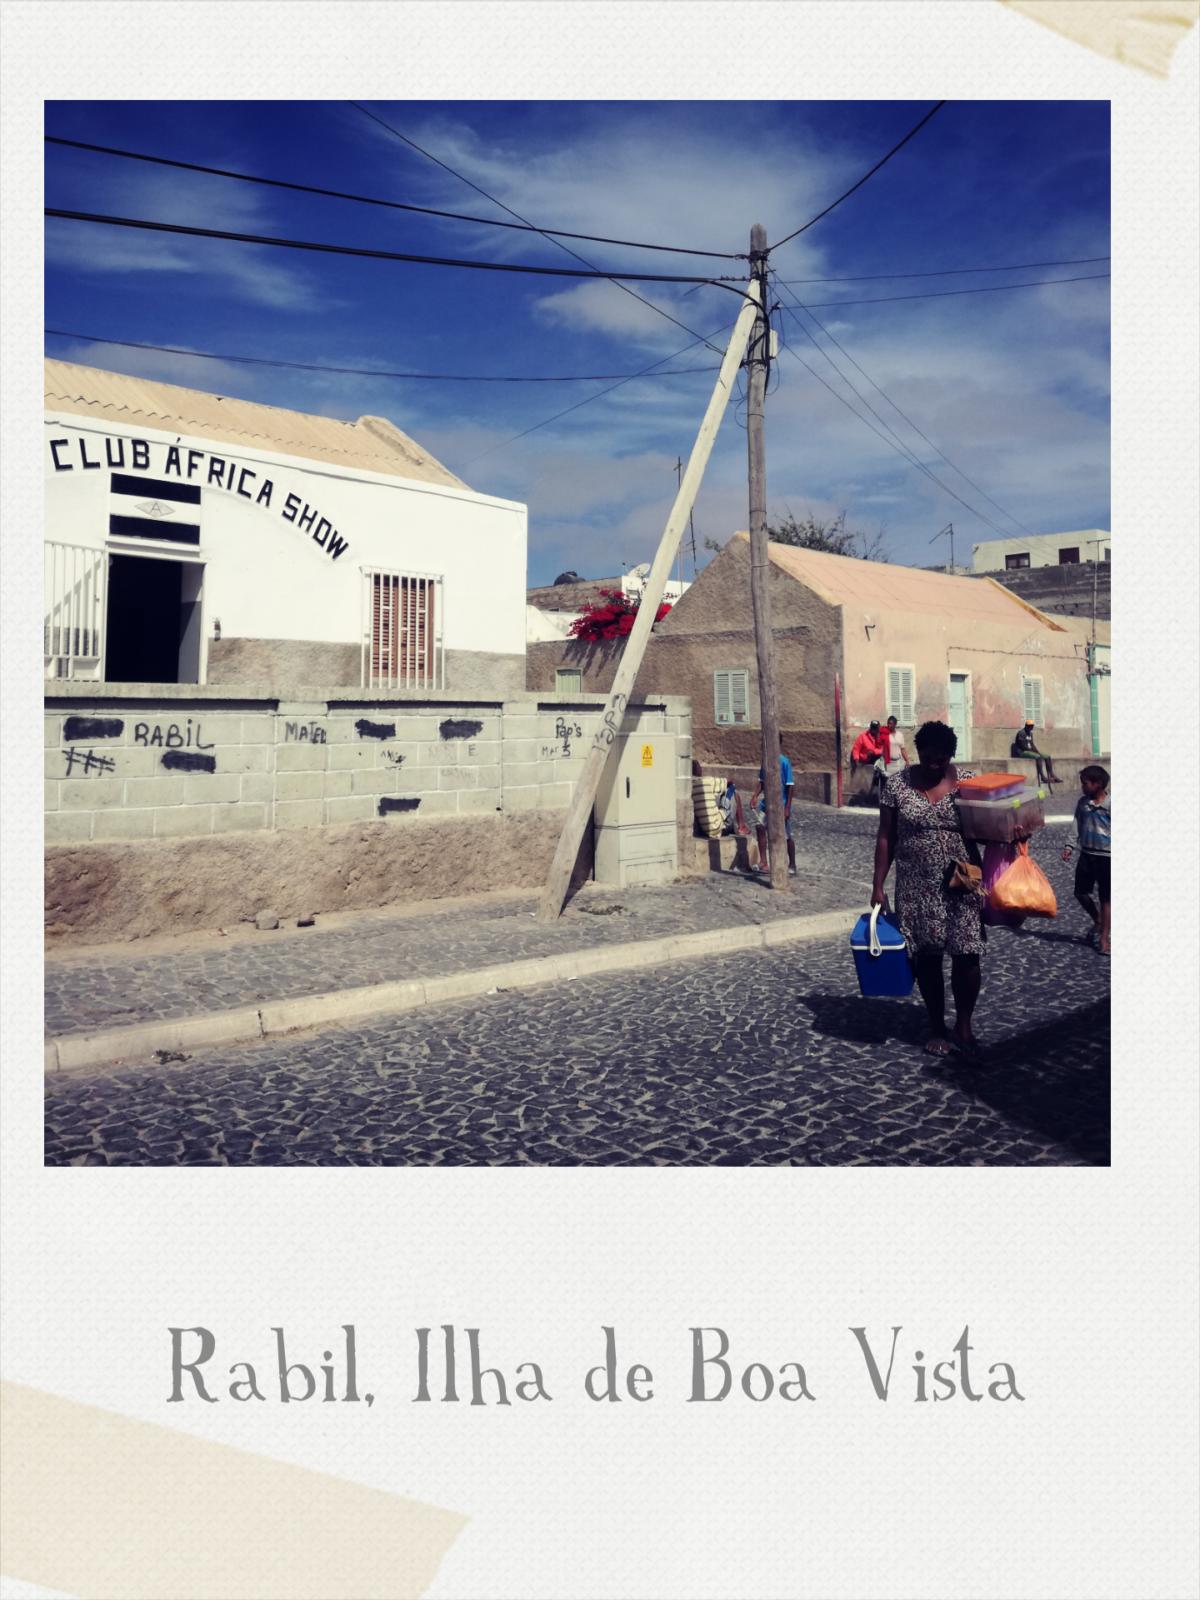 Rabil _ Ilha de Boa Vista, 6 febbraio